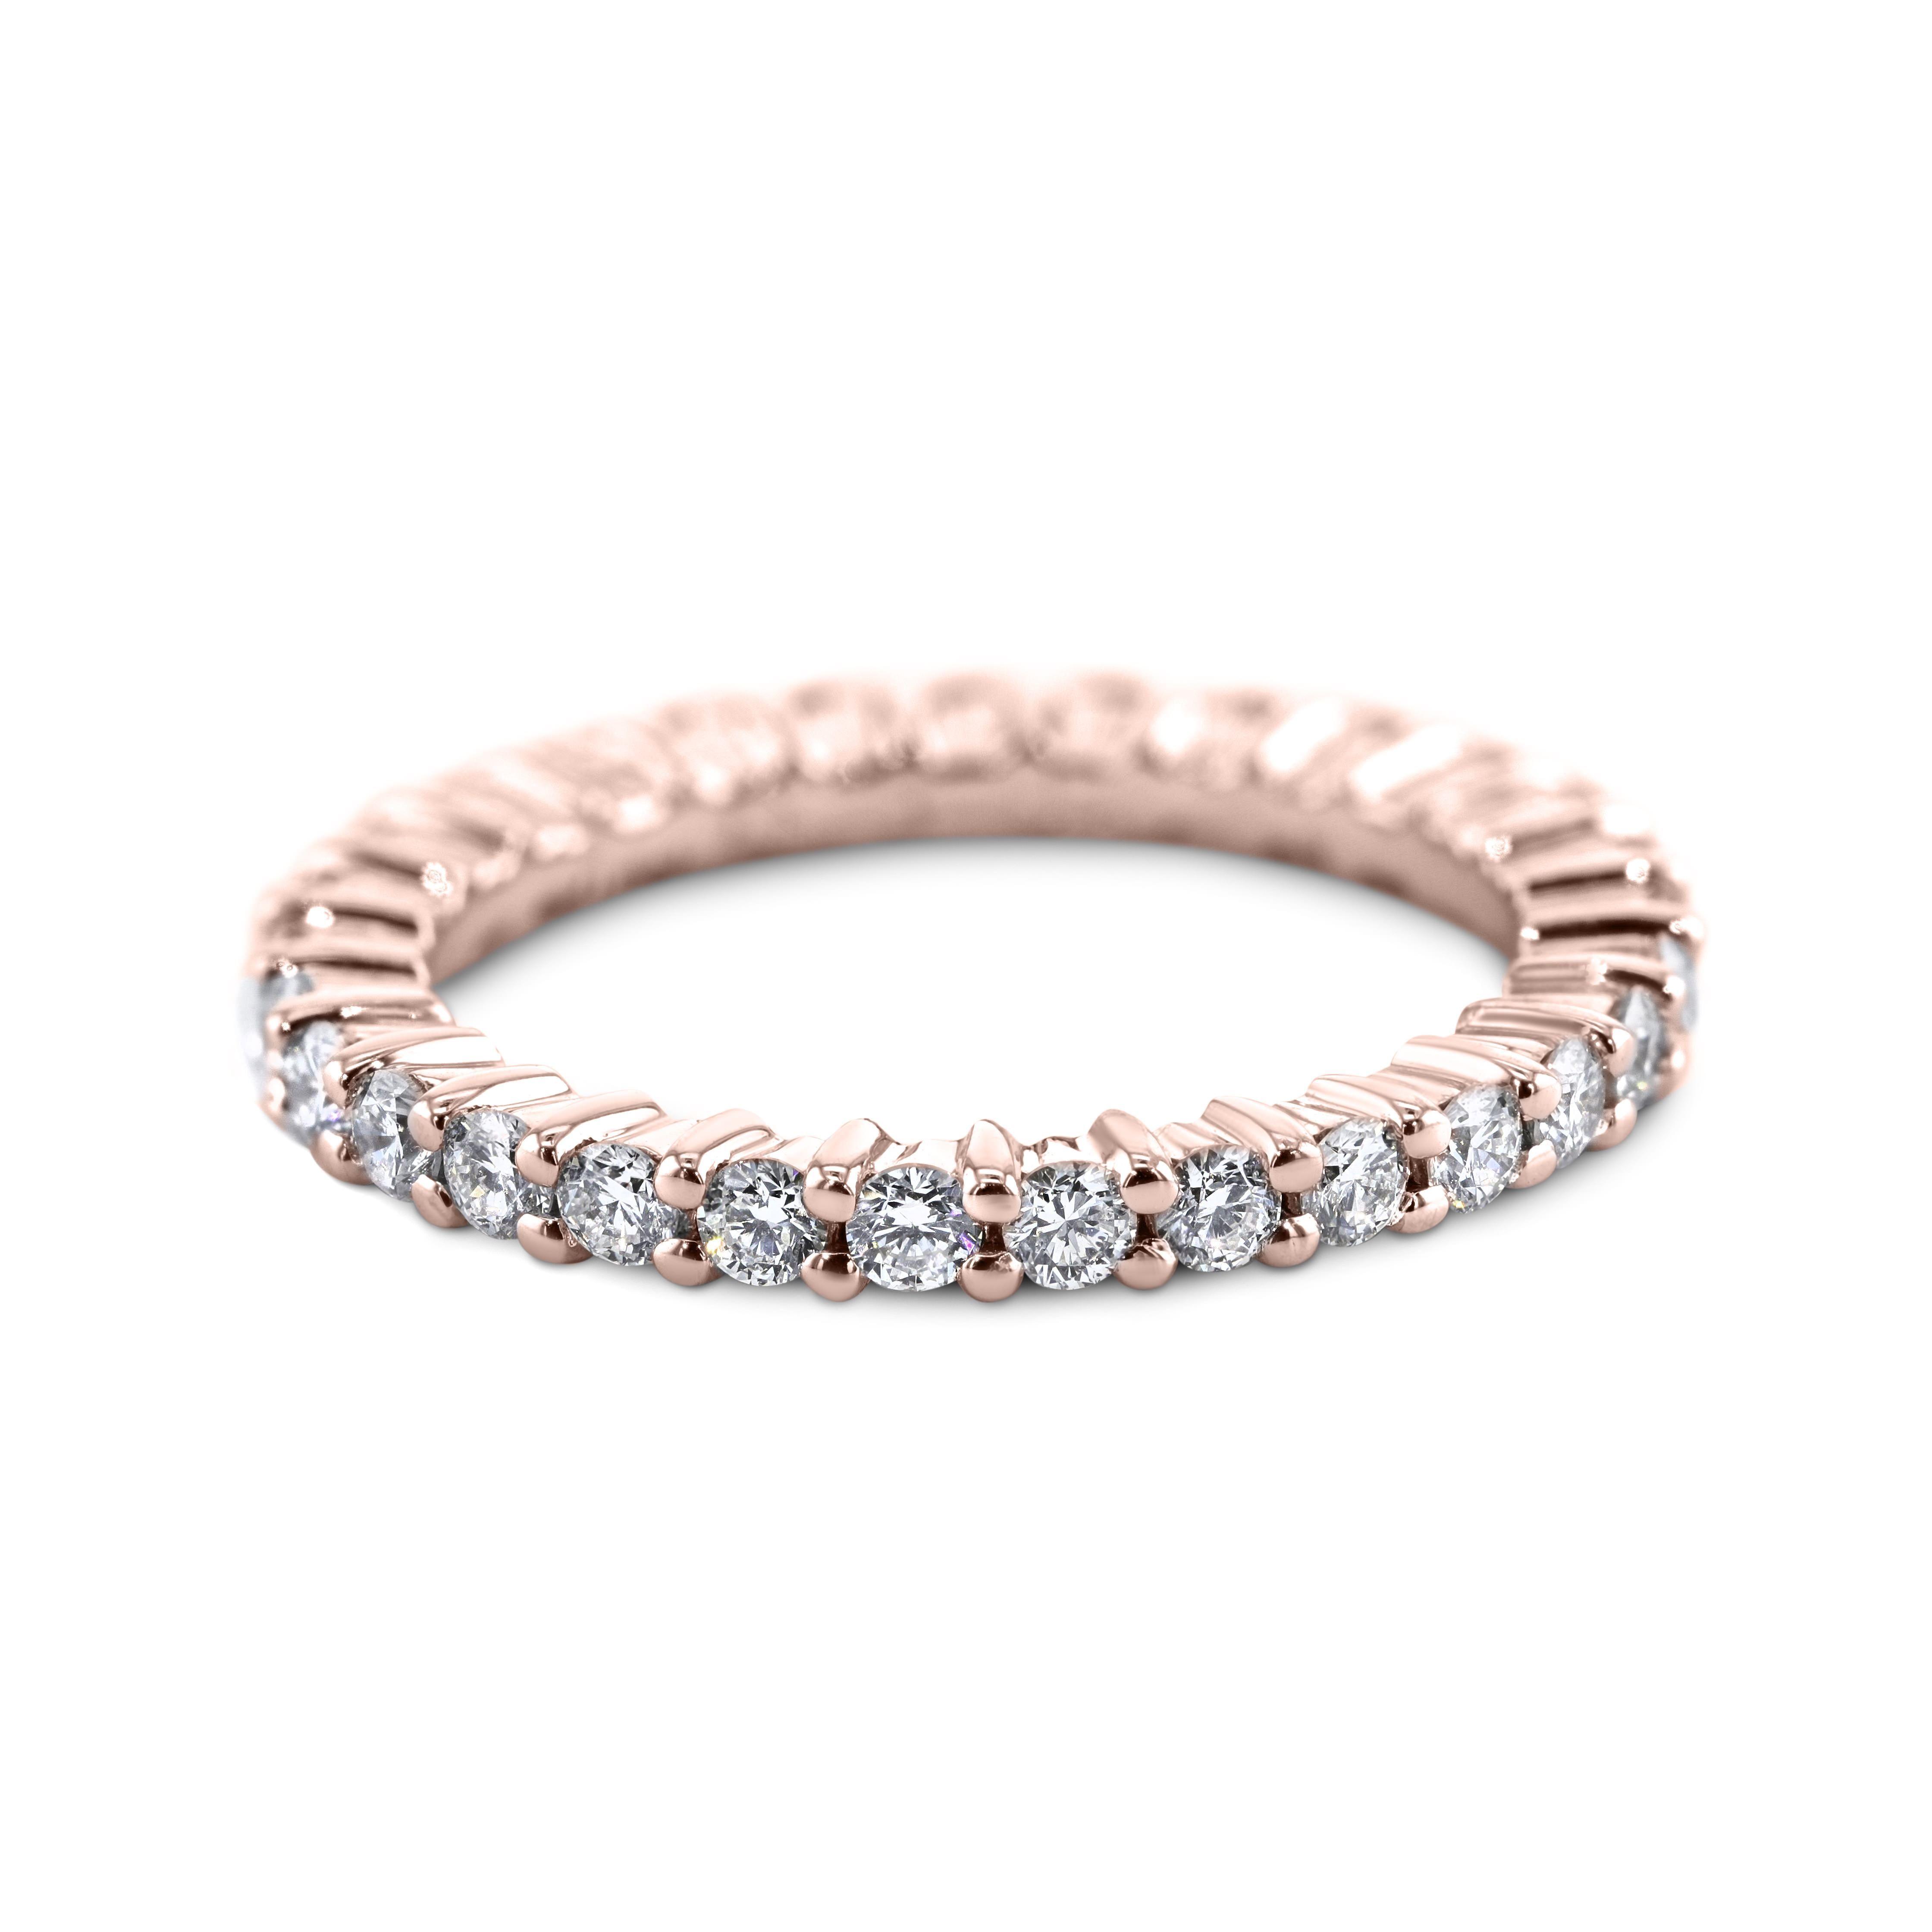 0.87 Carat Diamond Wedding Band 18K Rose Gold Eternity